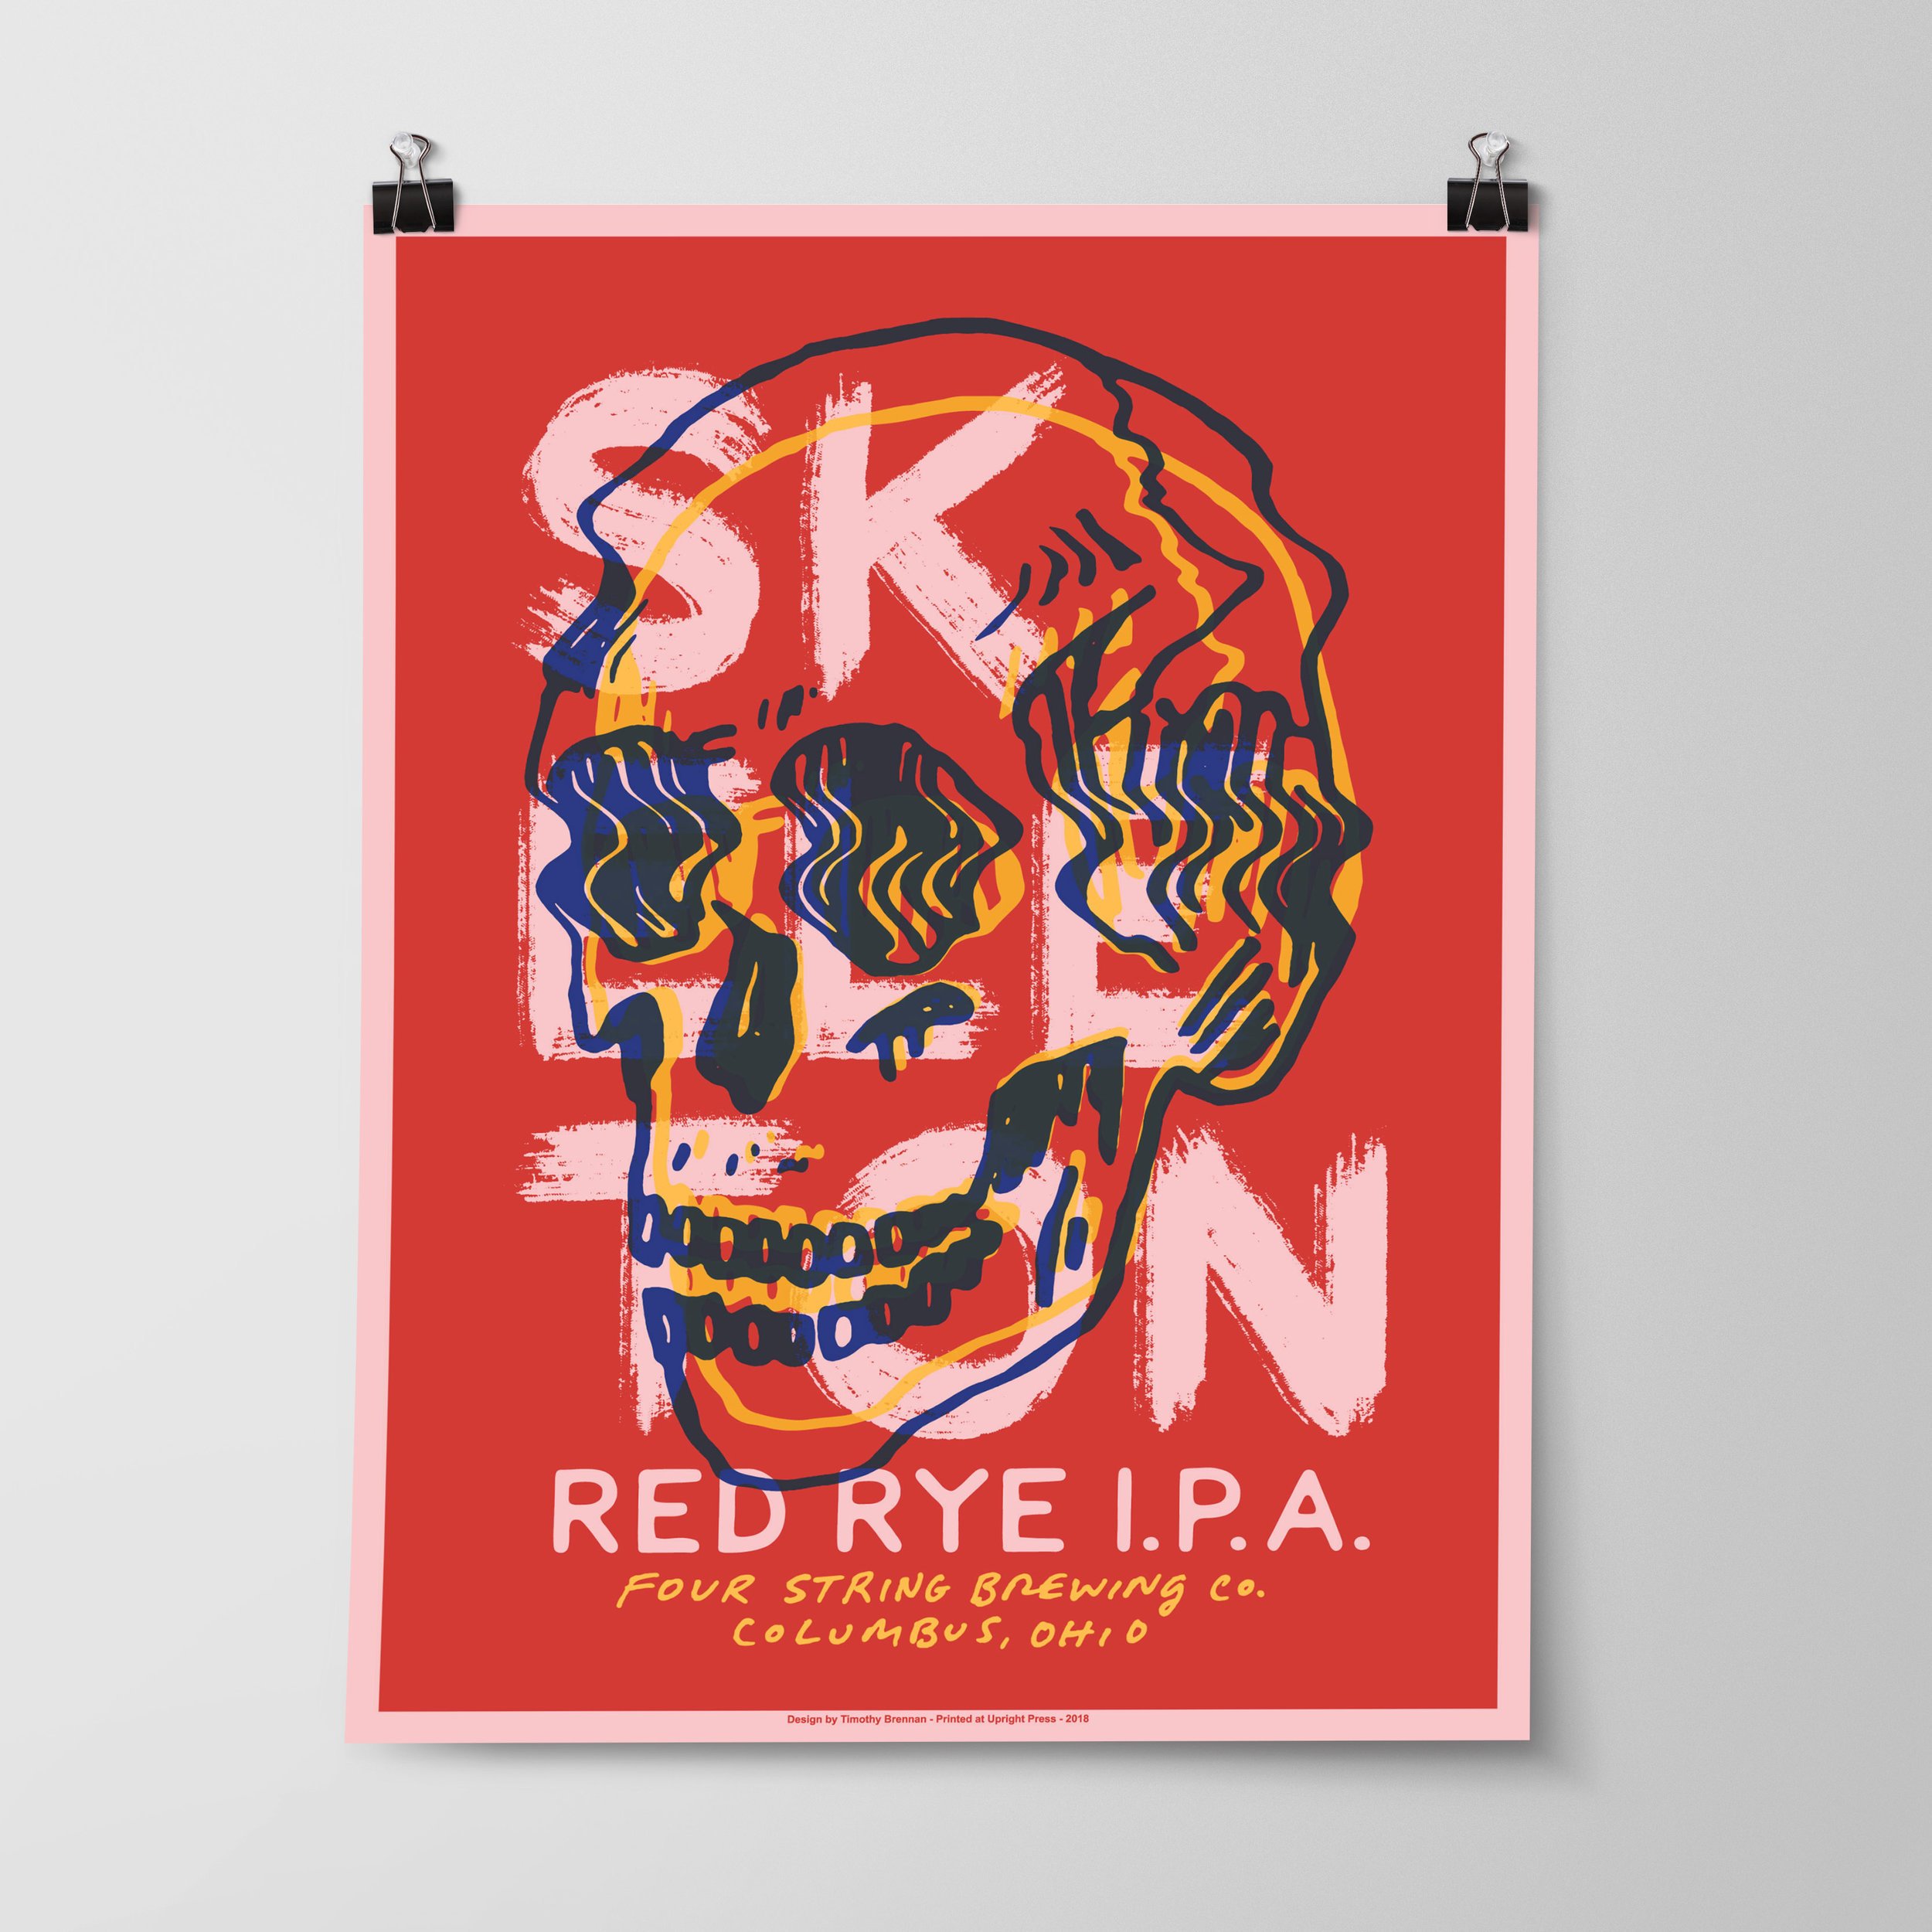 TB_Skeleton Red Rye_Poster_mockup_square.jpg